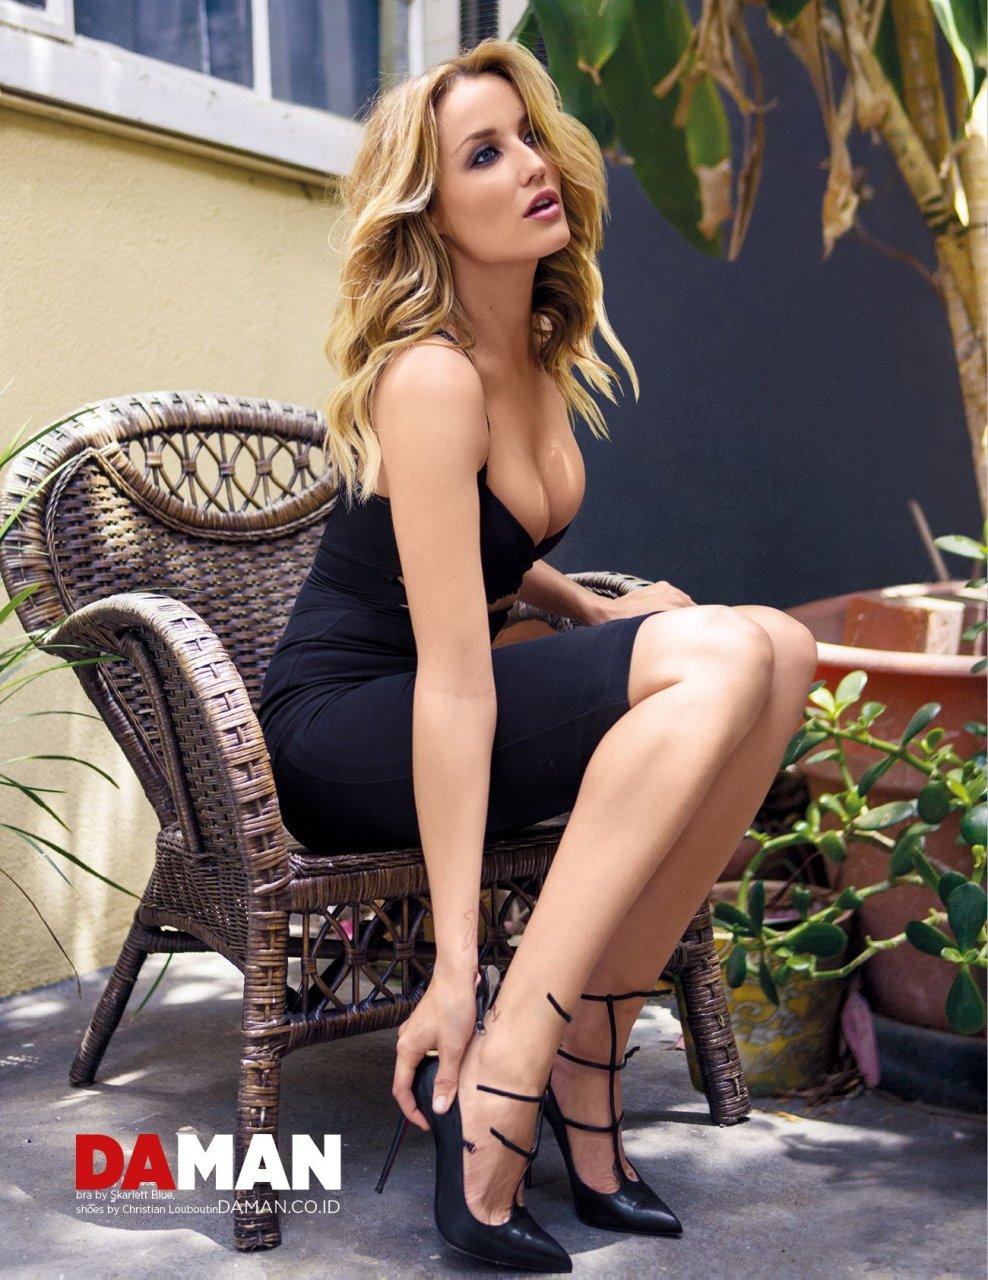 Kylie jenner instagram photos,Rachel mccord sexy 20 photos Porno videos Valeria Golino, Geno Lechner Immortal Beloved -,Frenchy morgan in bikini washing her car in malibu